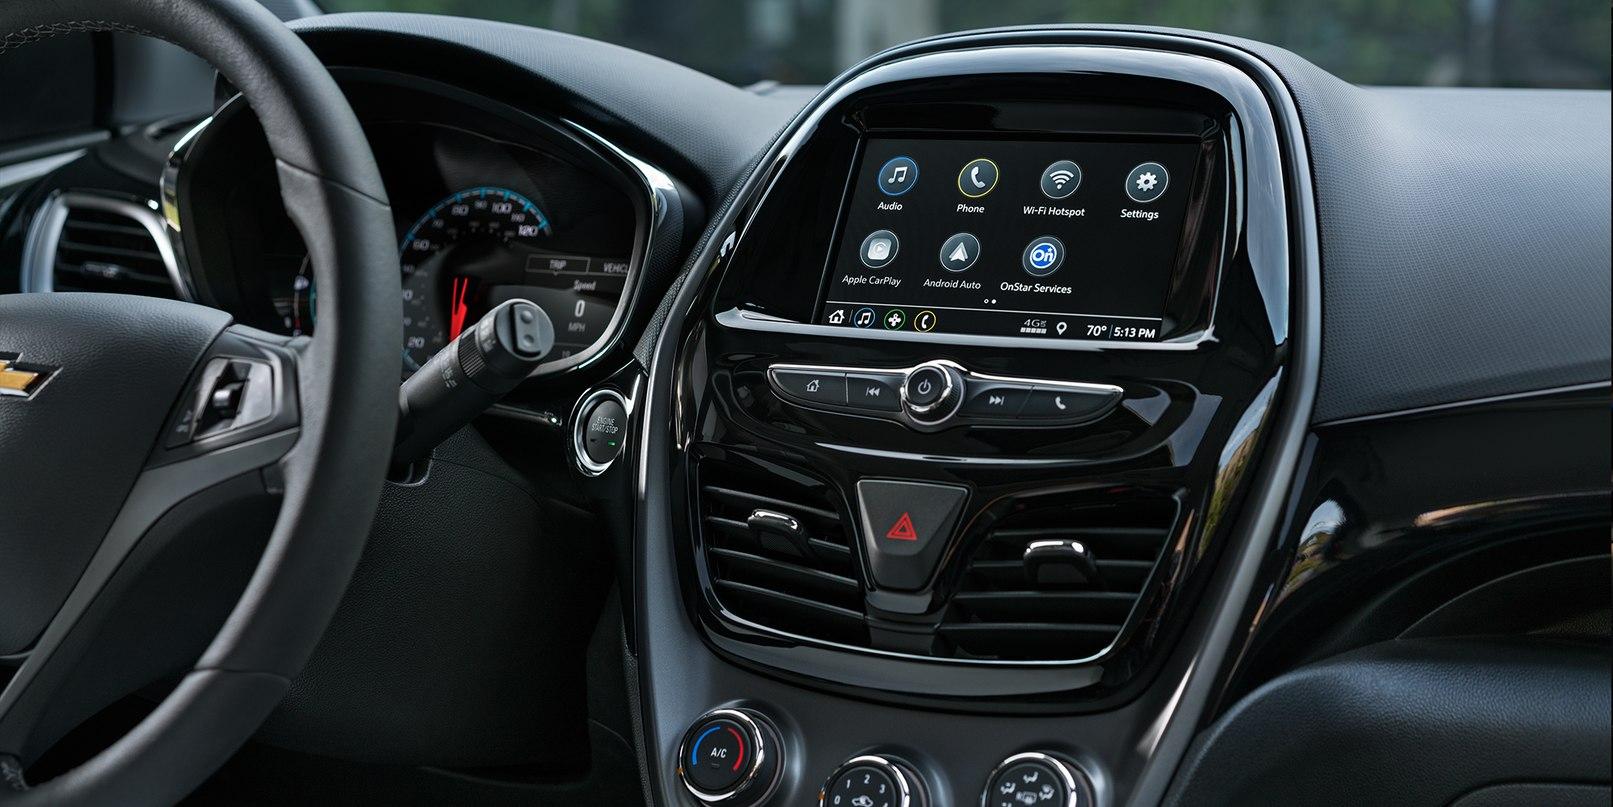 2019 Chevrolet Spark Center Console